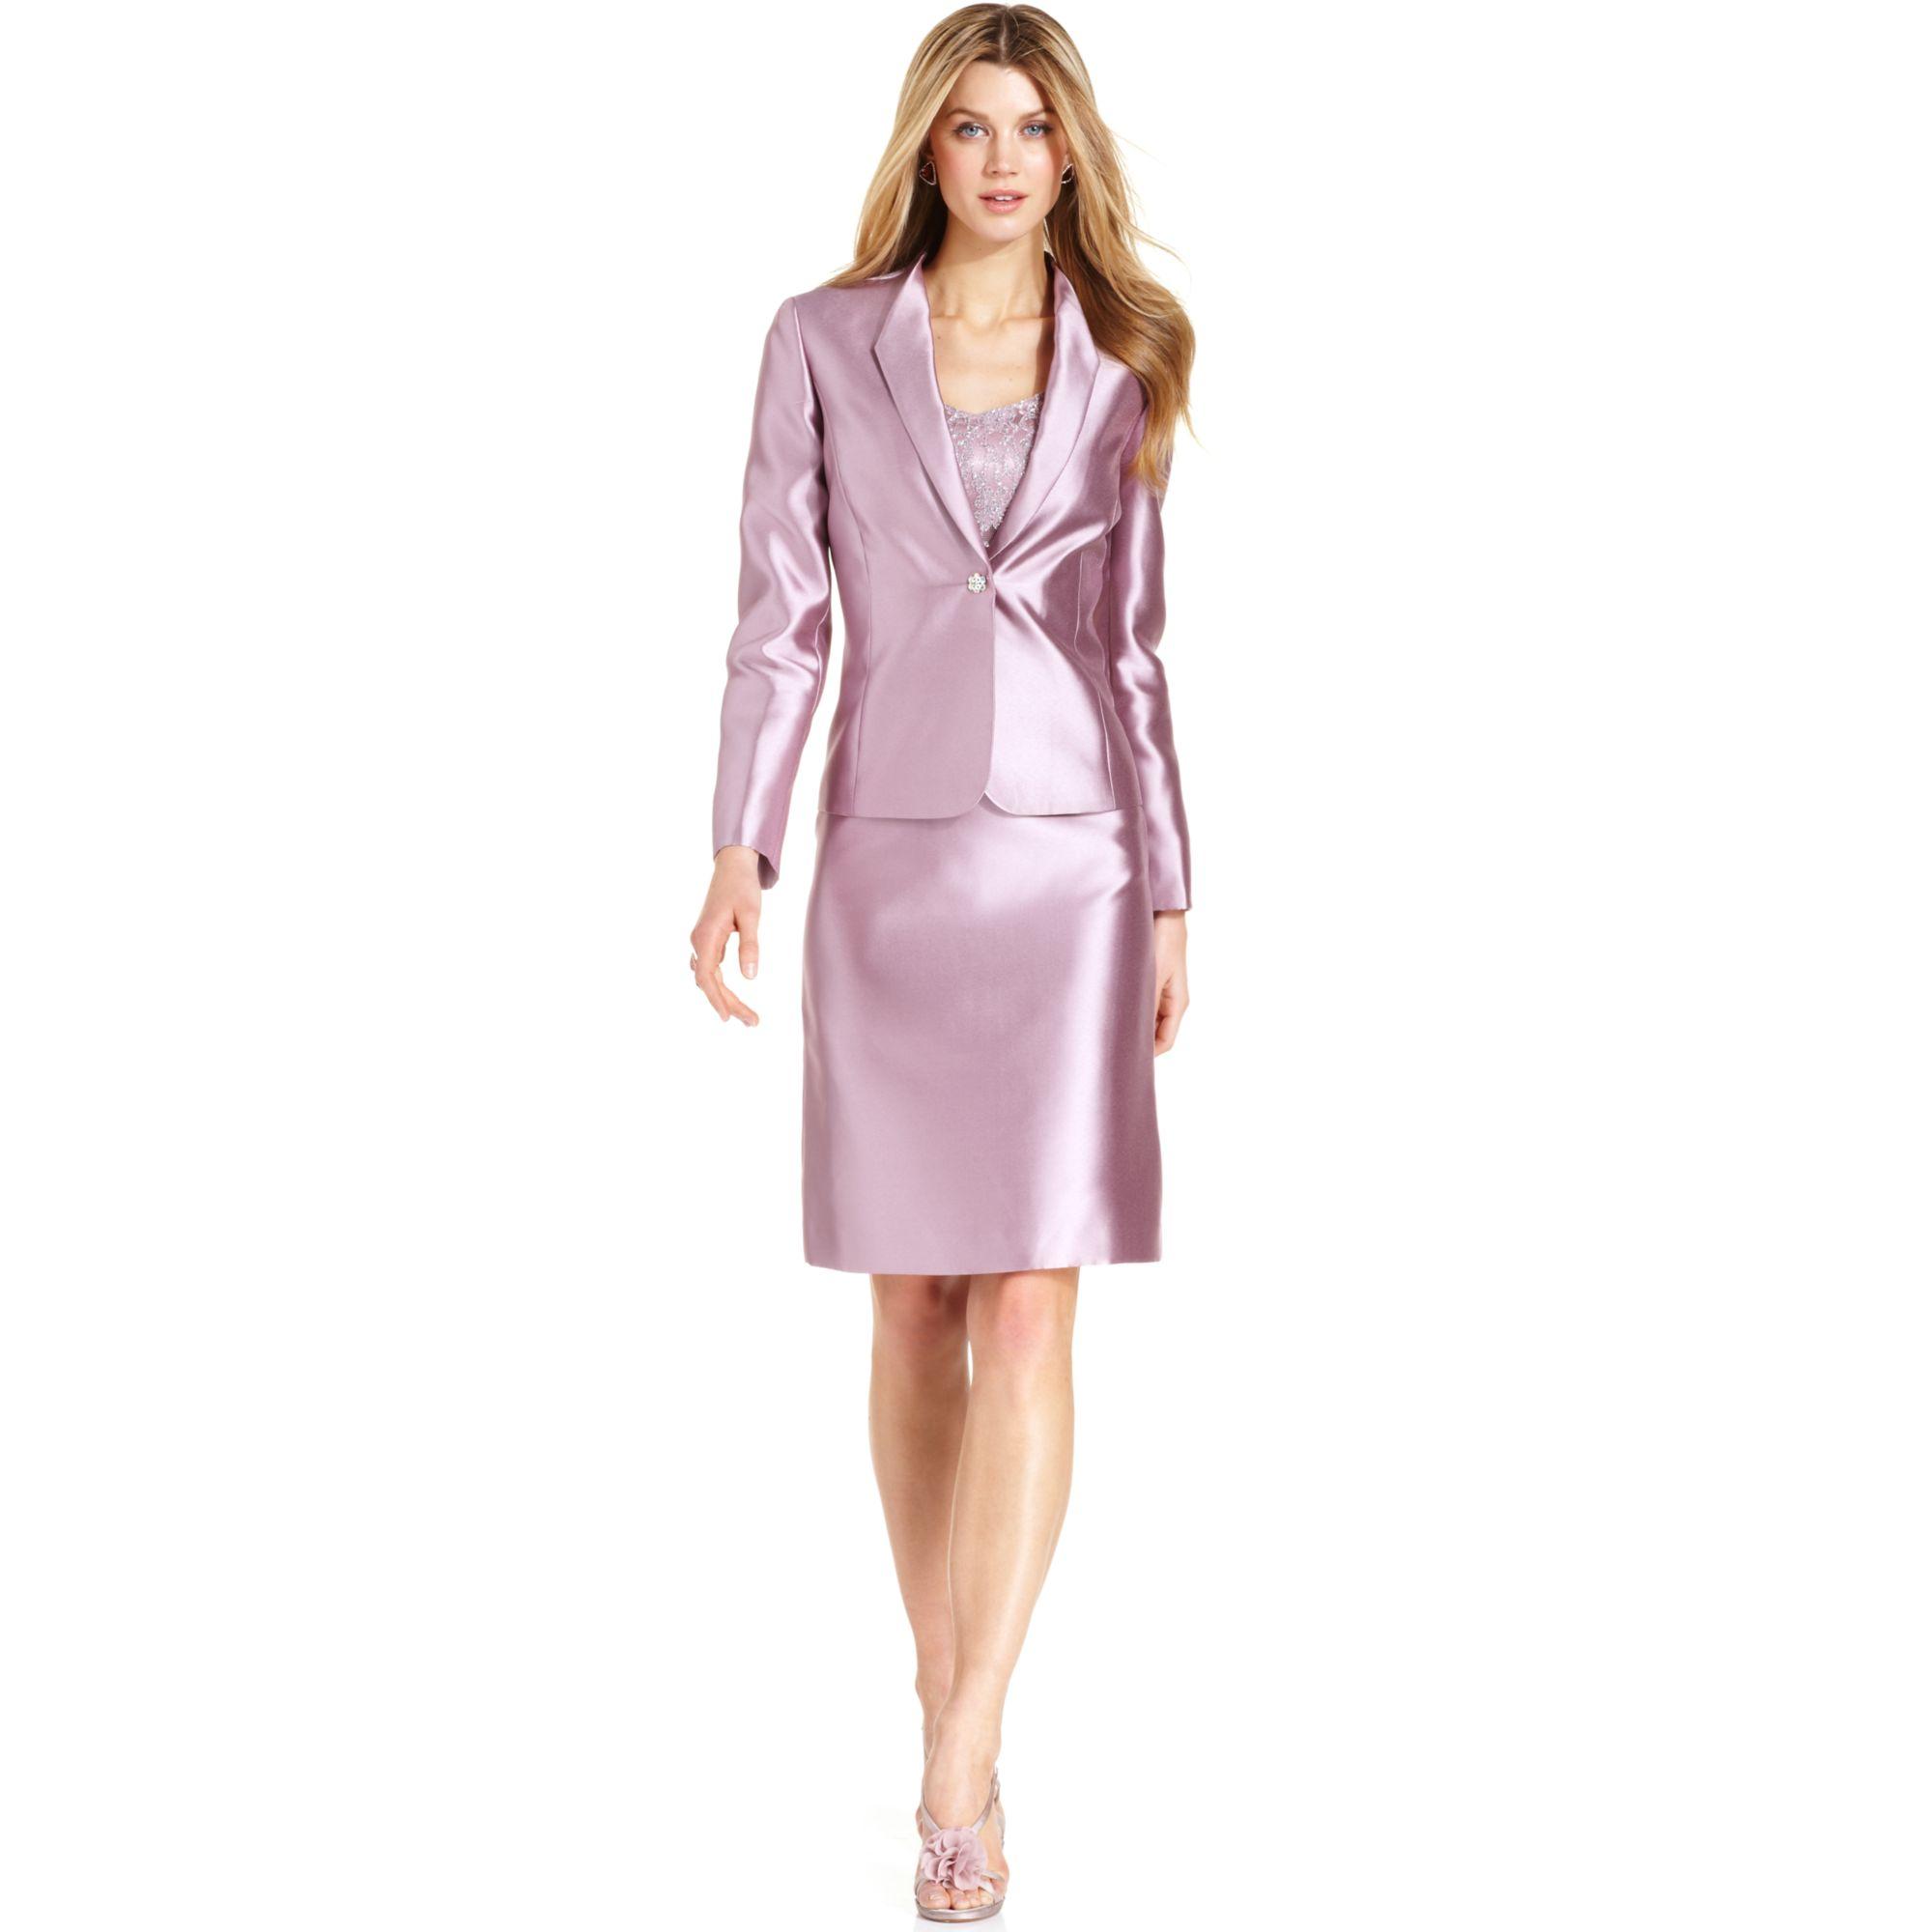 18ba798ac73a Tahari By Asl Skirt Suit in Purple - Lyst